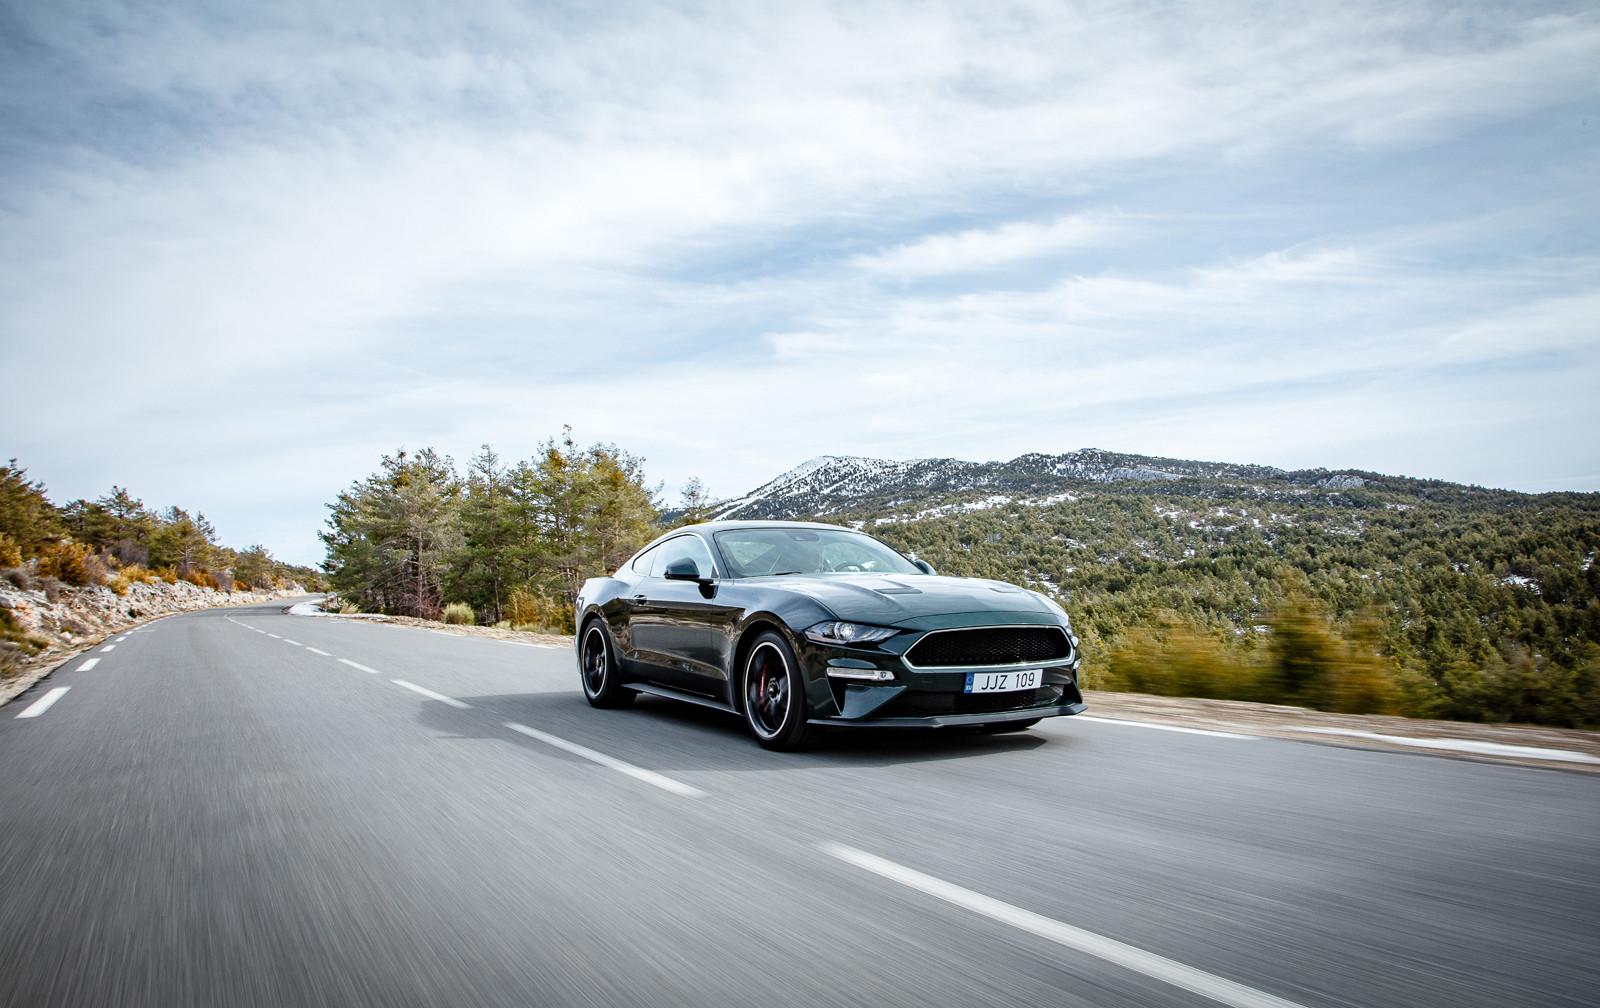 Foto de Ford Mustang Bullit (versión europea) (12/15)